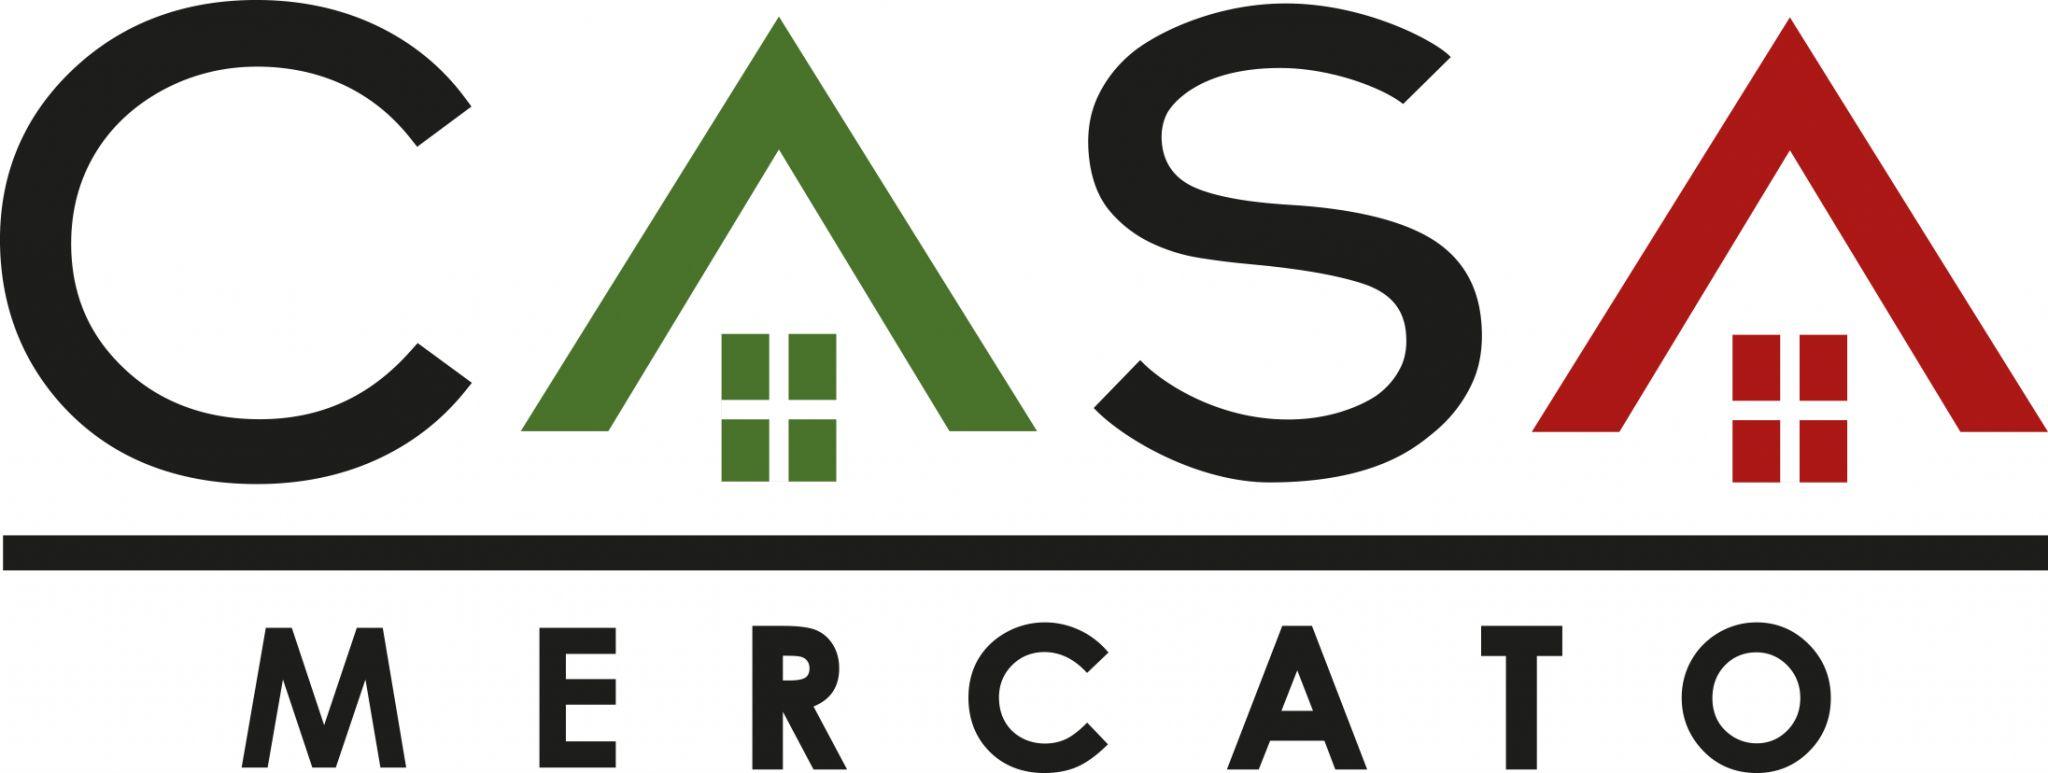 Casamercato S.N.C.